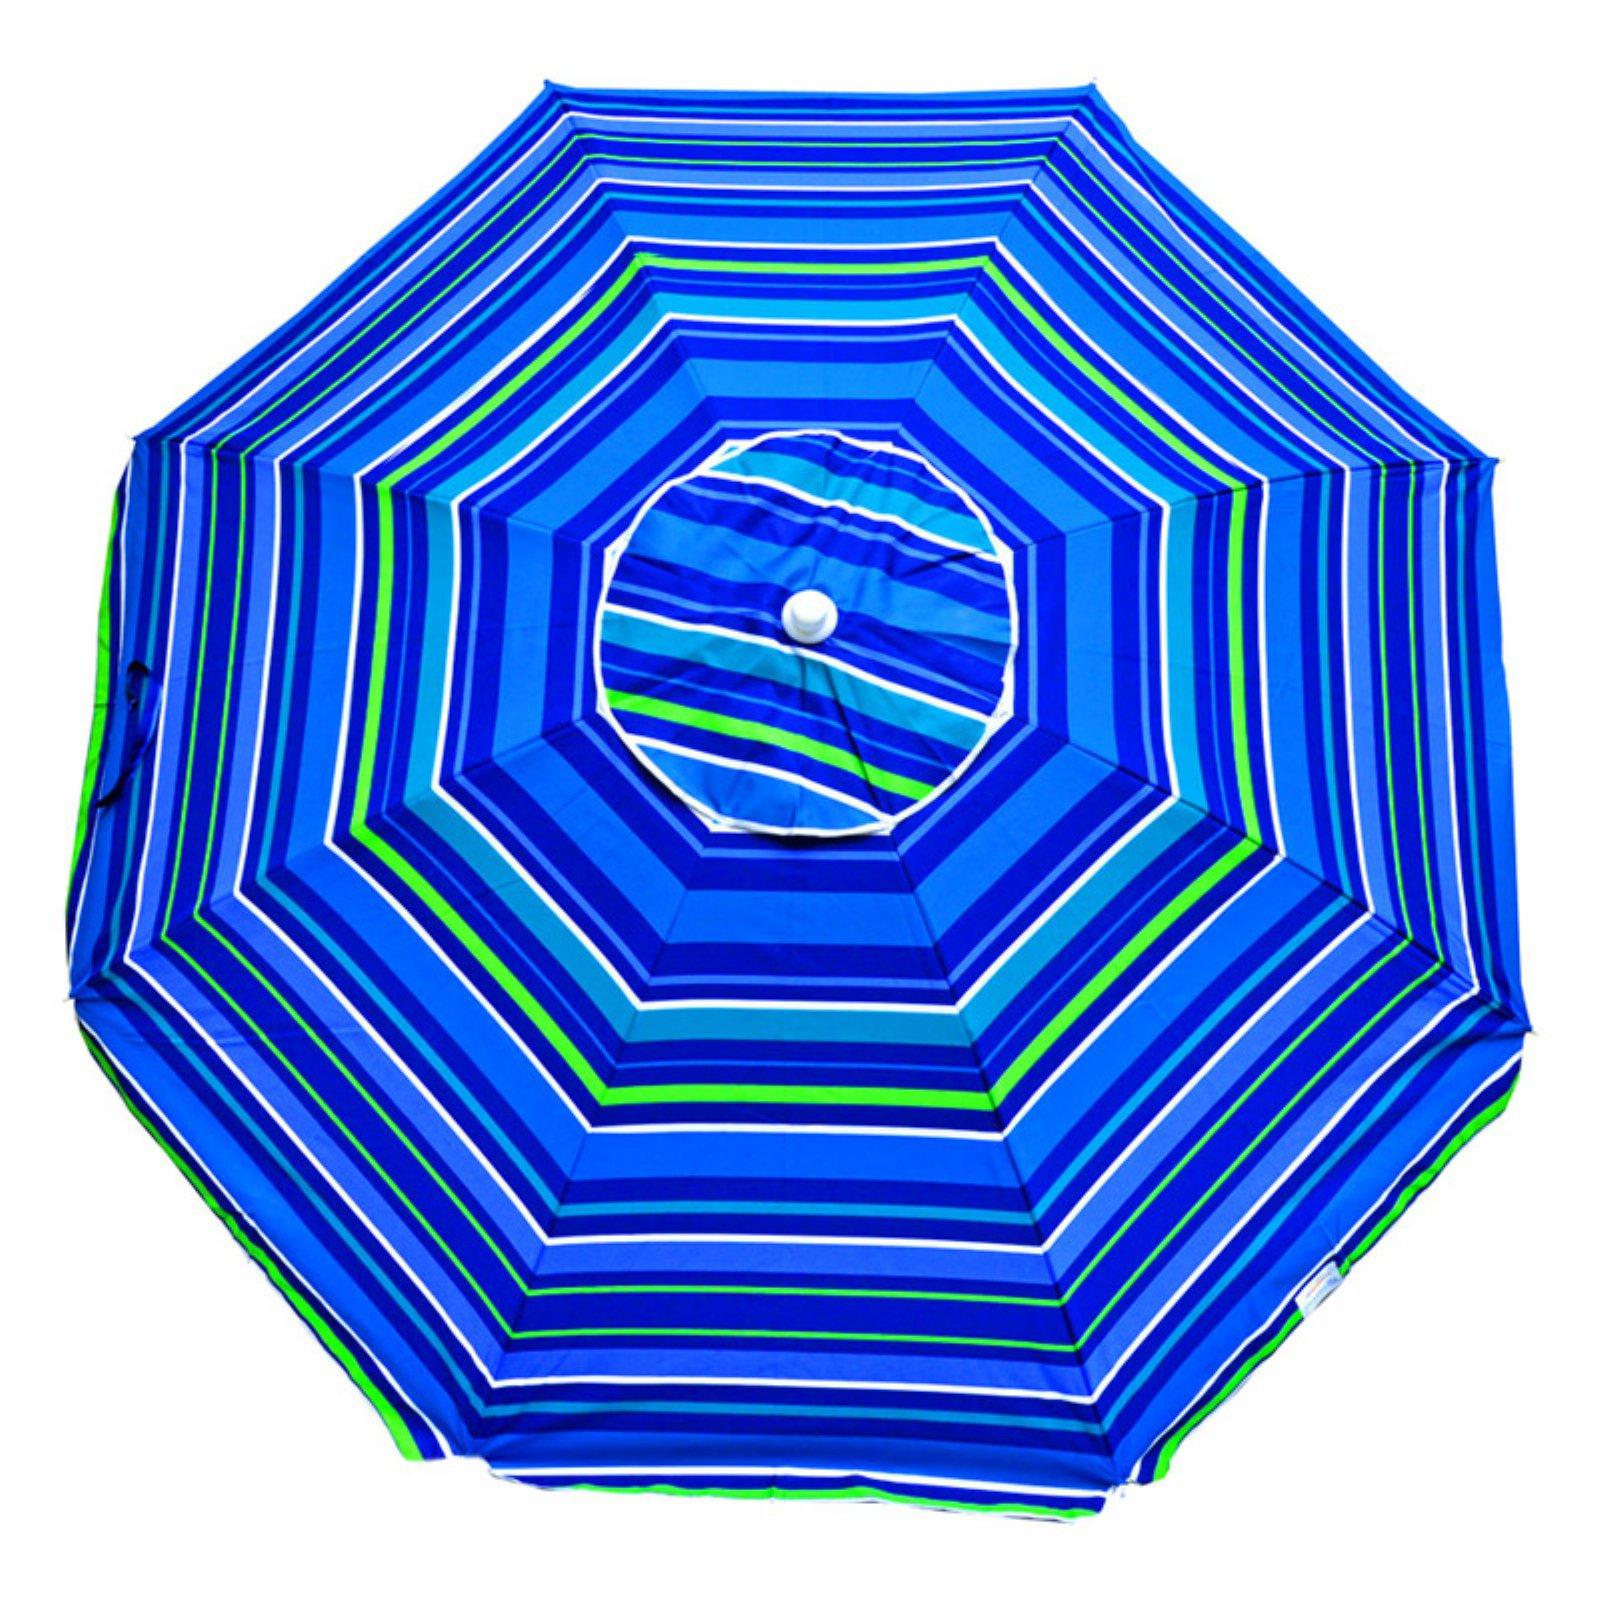 Shadezilla 7.5 ft. Wind Resistant Beach Umbrella with Dual Steel Rib Structure